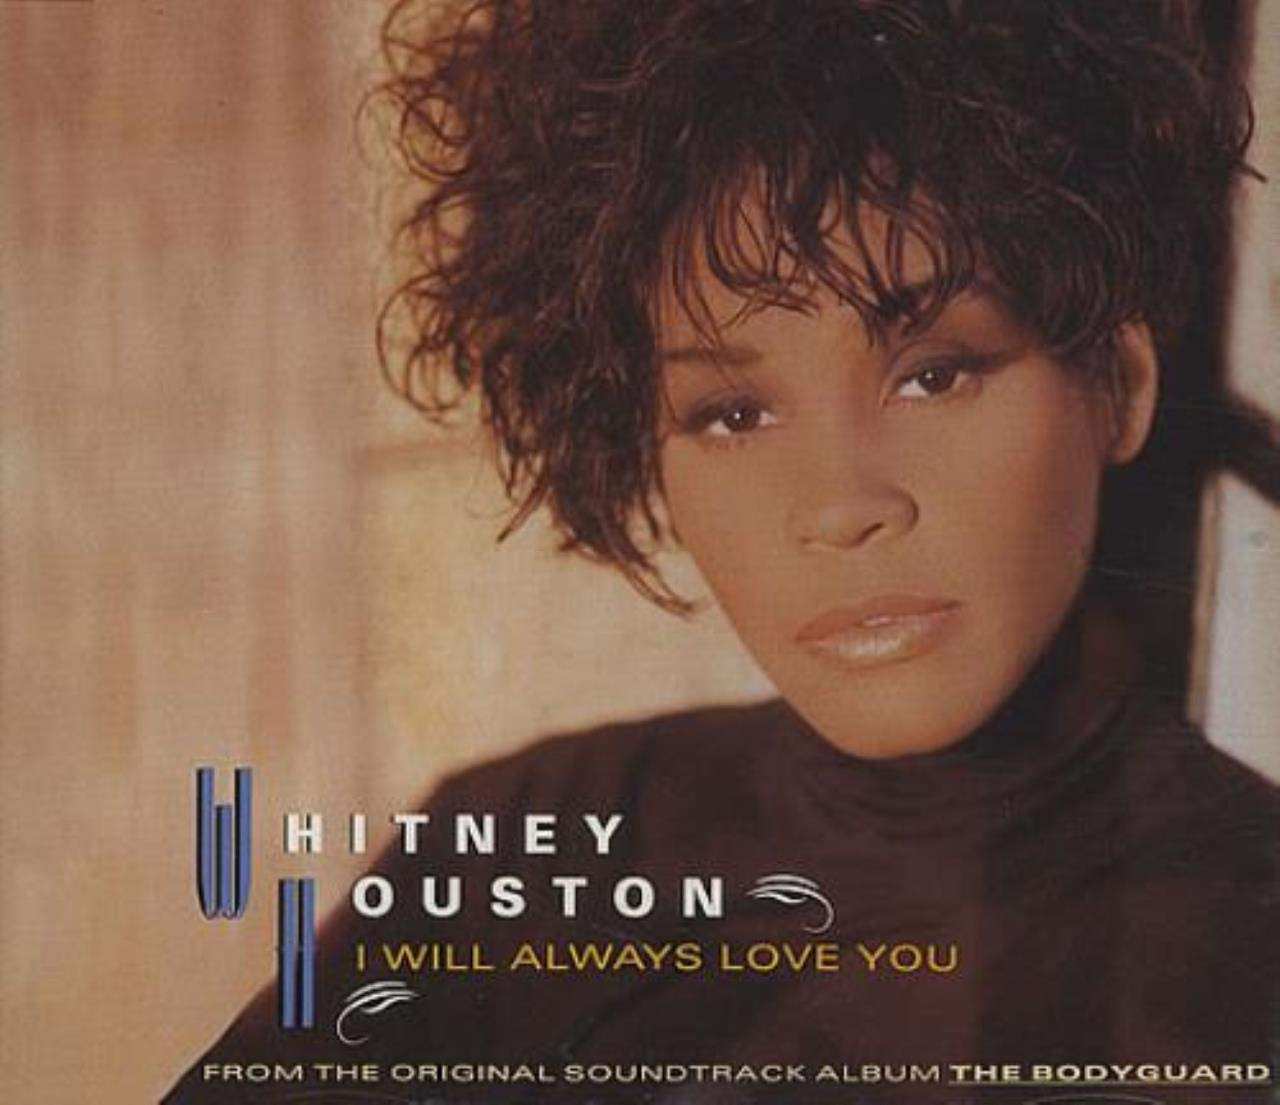 I will always love you - Whitney